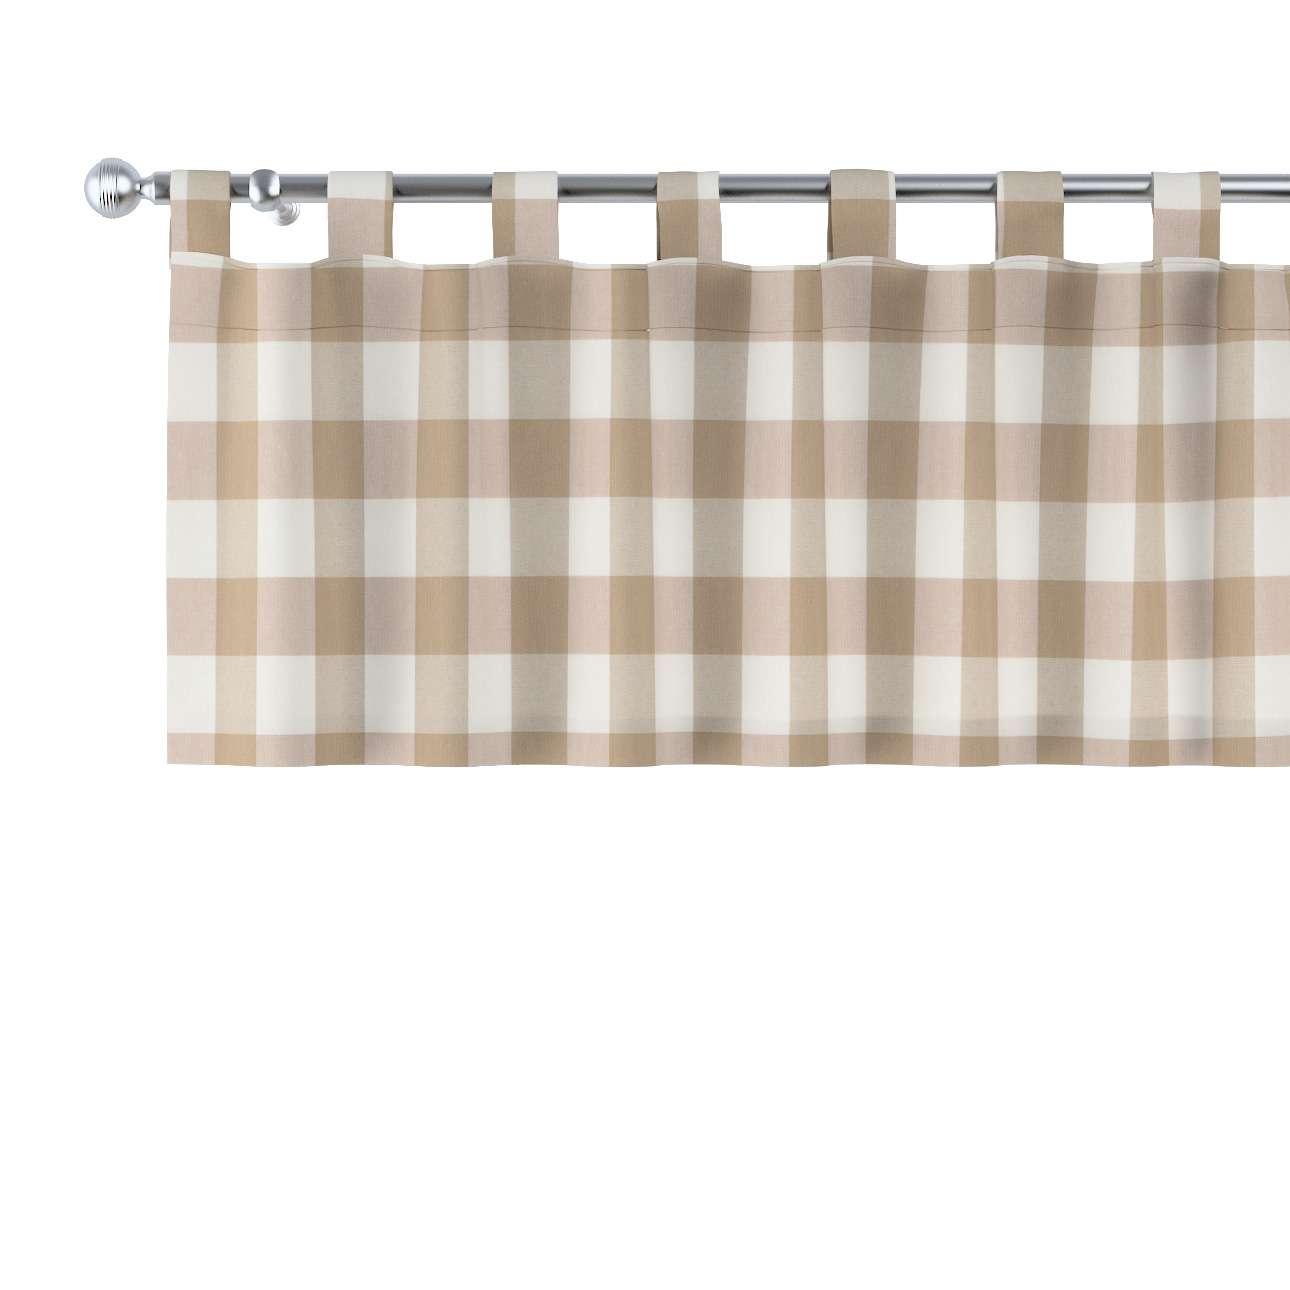 Lambrekin na szelkach w kolekcji Quadro, tkanina: 136-08